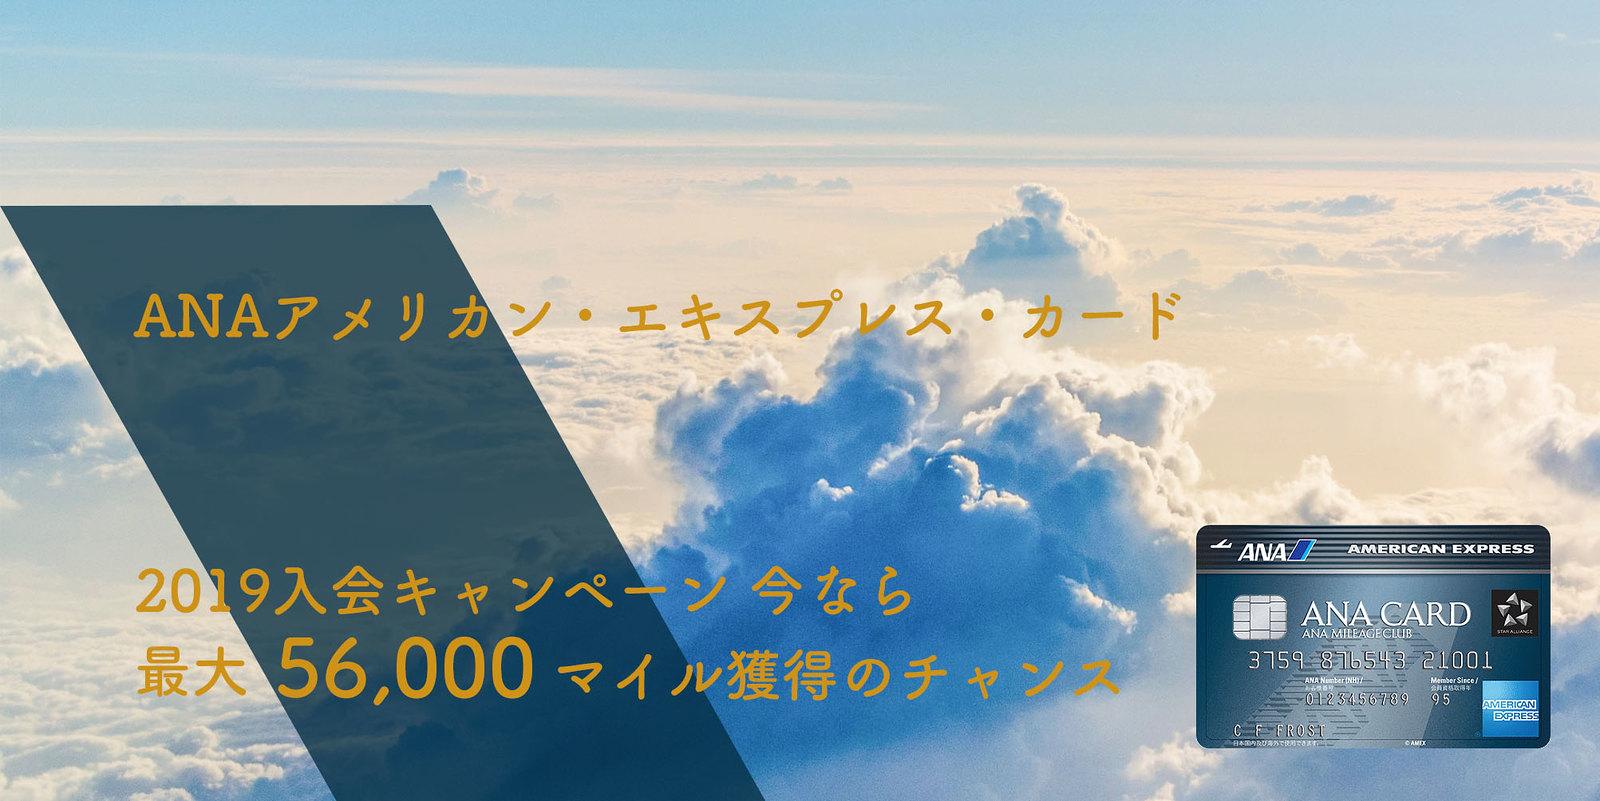 ANAアメックス 2019 入会キャンペーン最大56,000マイル